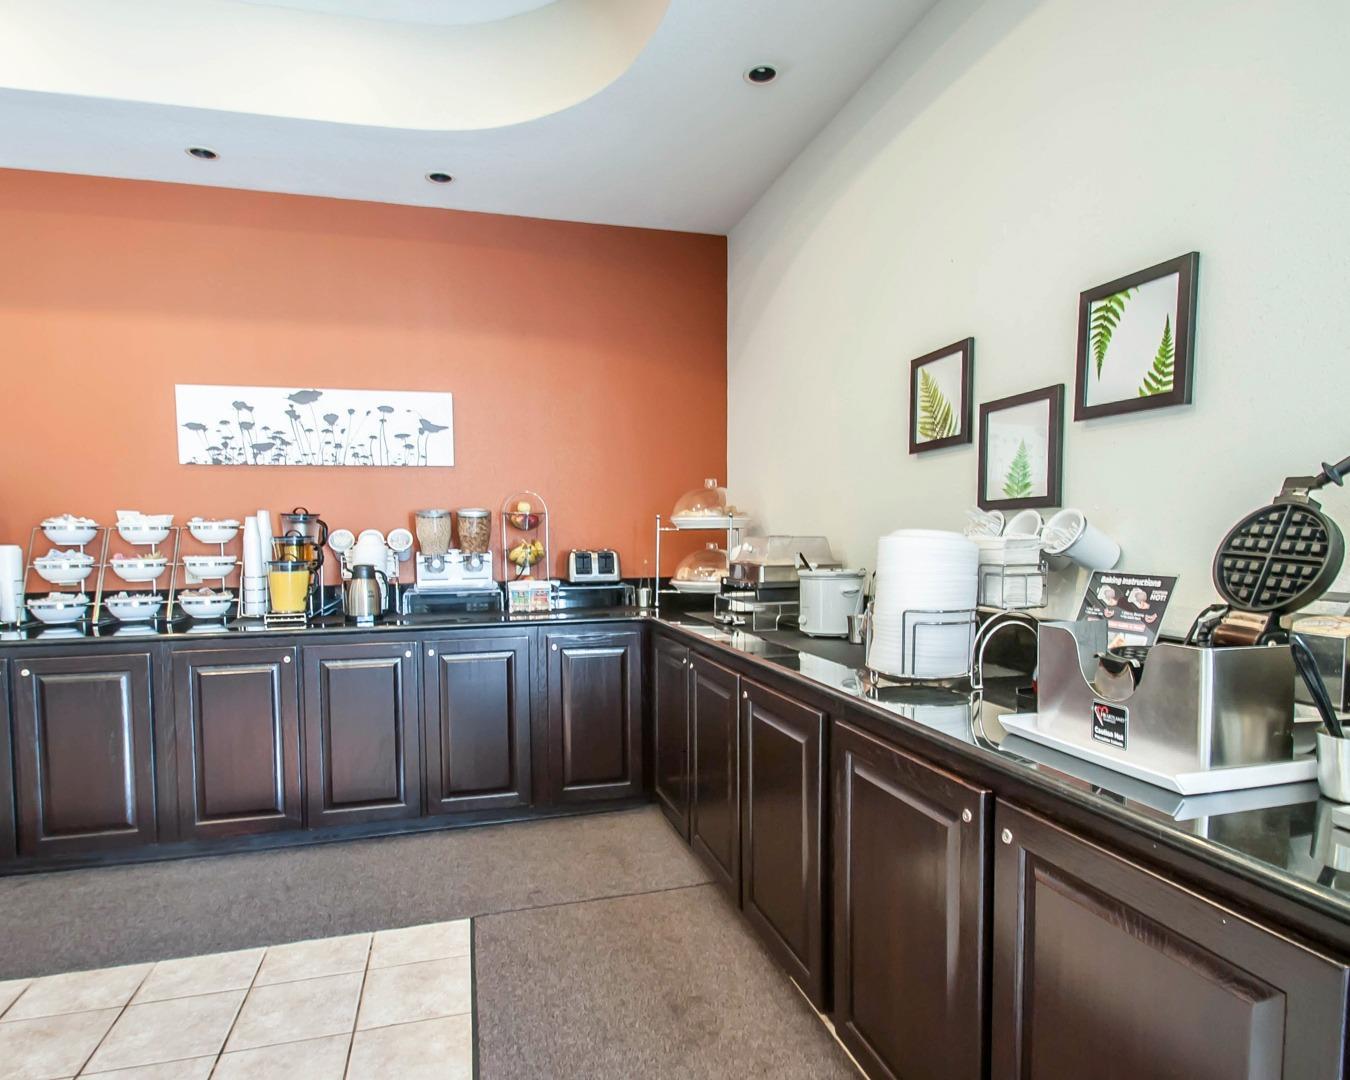 Sleep Inn & Suites Lake Of The Ozarks, Camdenton MO